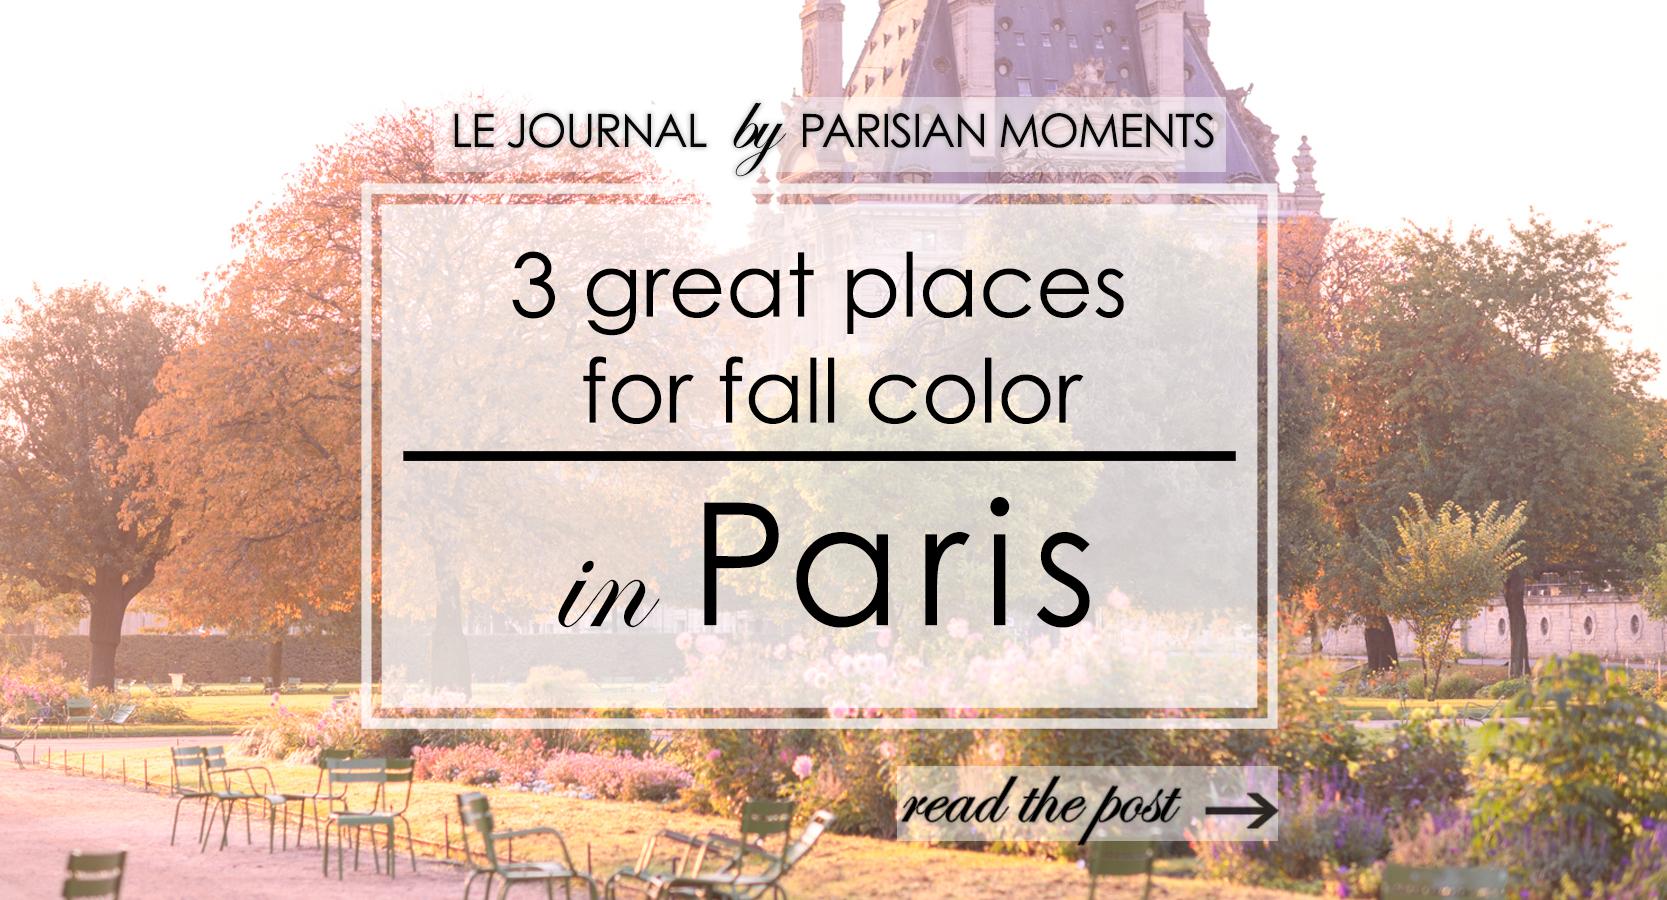 3 great places autumn slide show.jpg